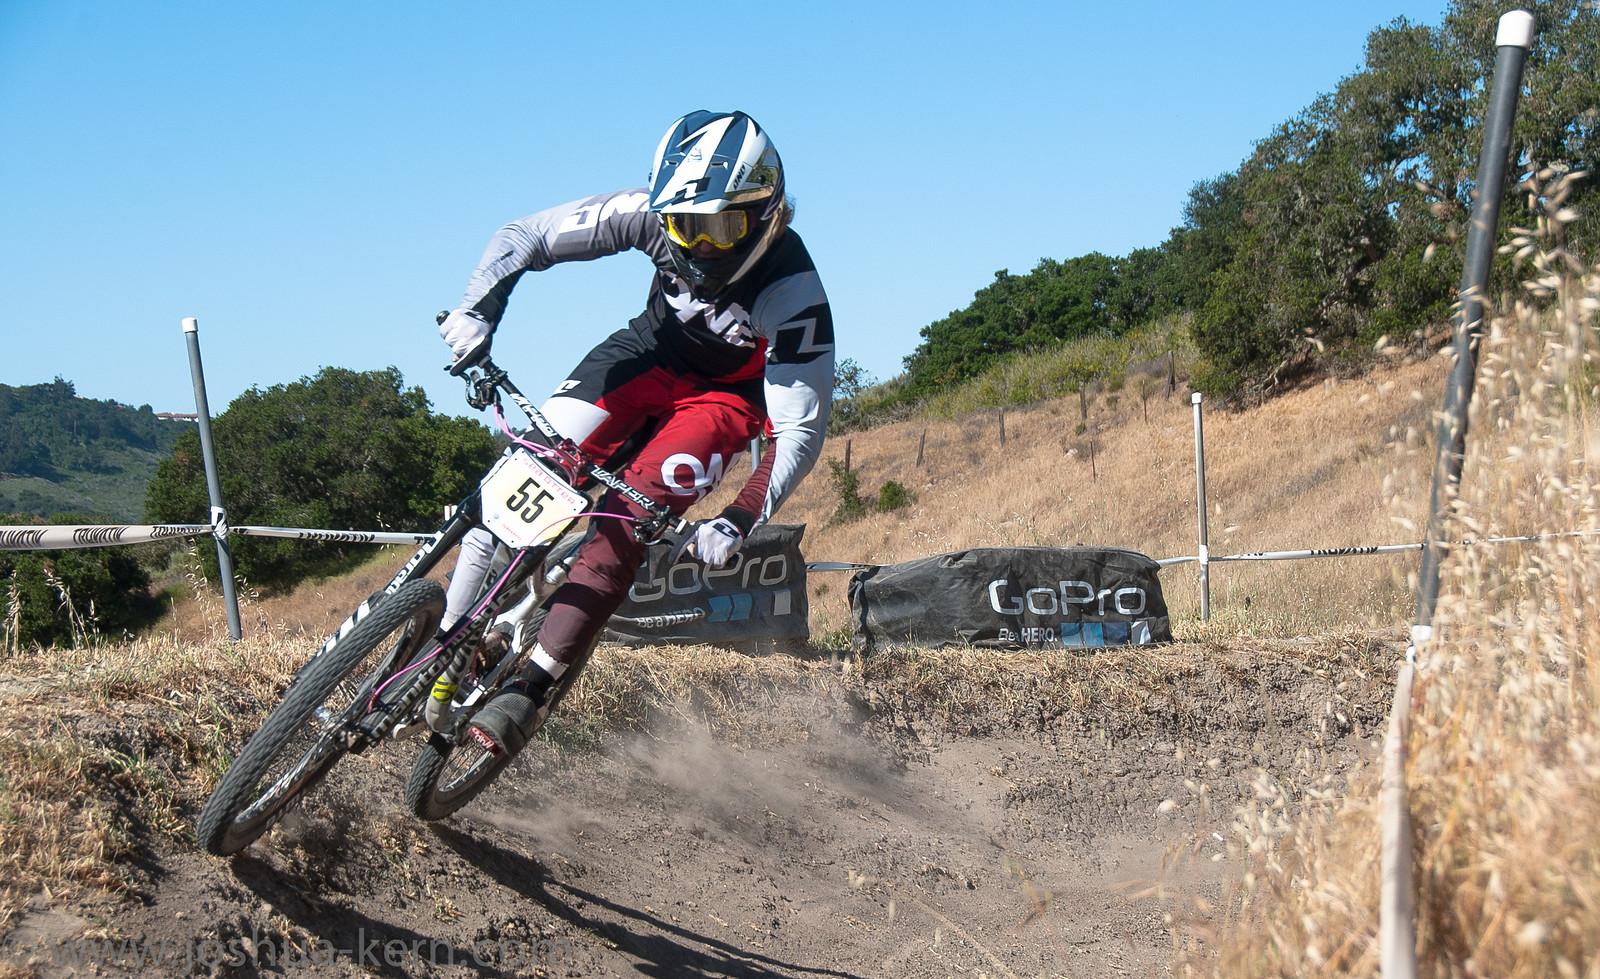 4-19-13DHPractice (21 of 36) - jkern620 - Mountain Biking Pictures - Vital MTB